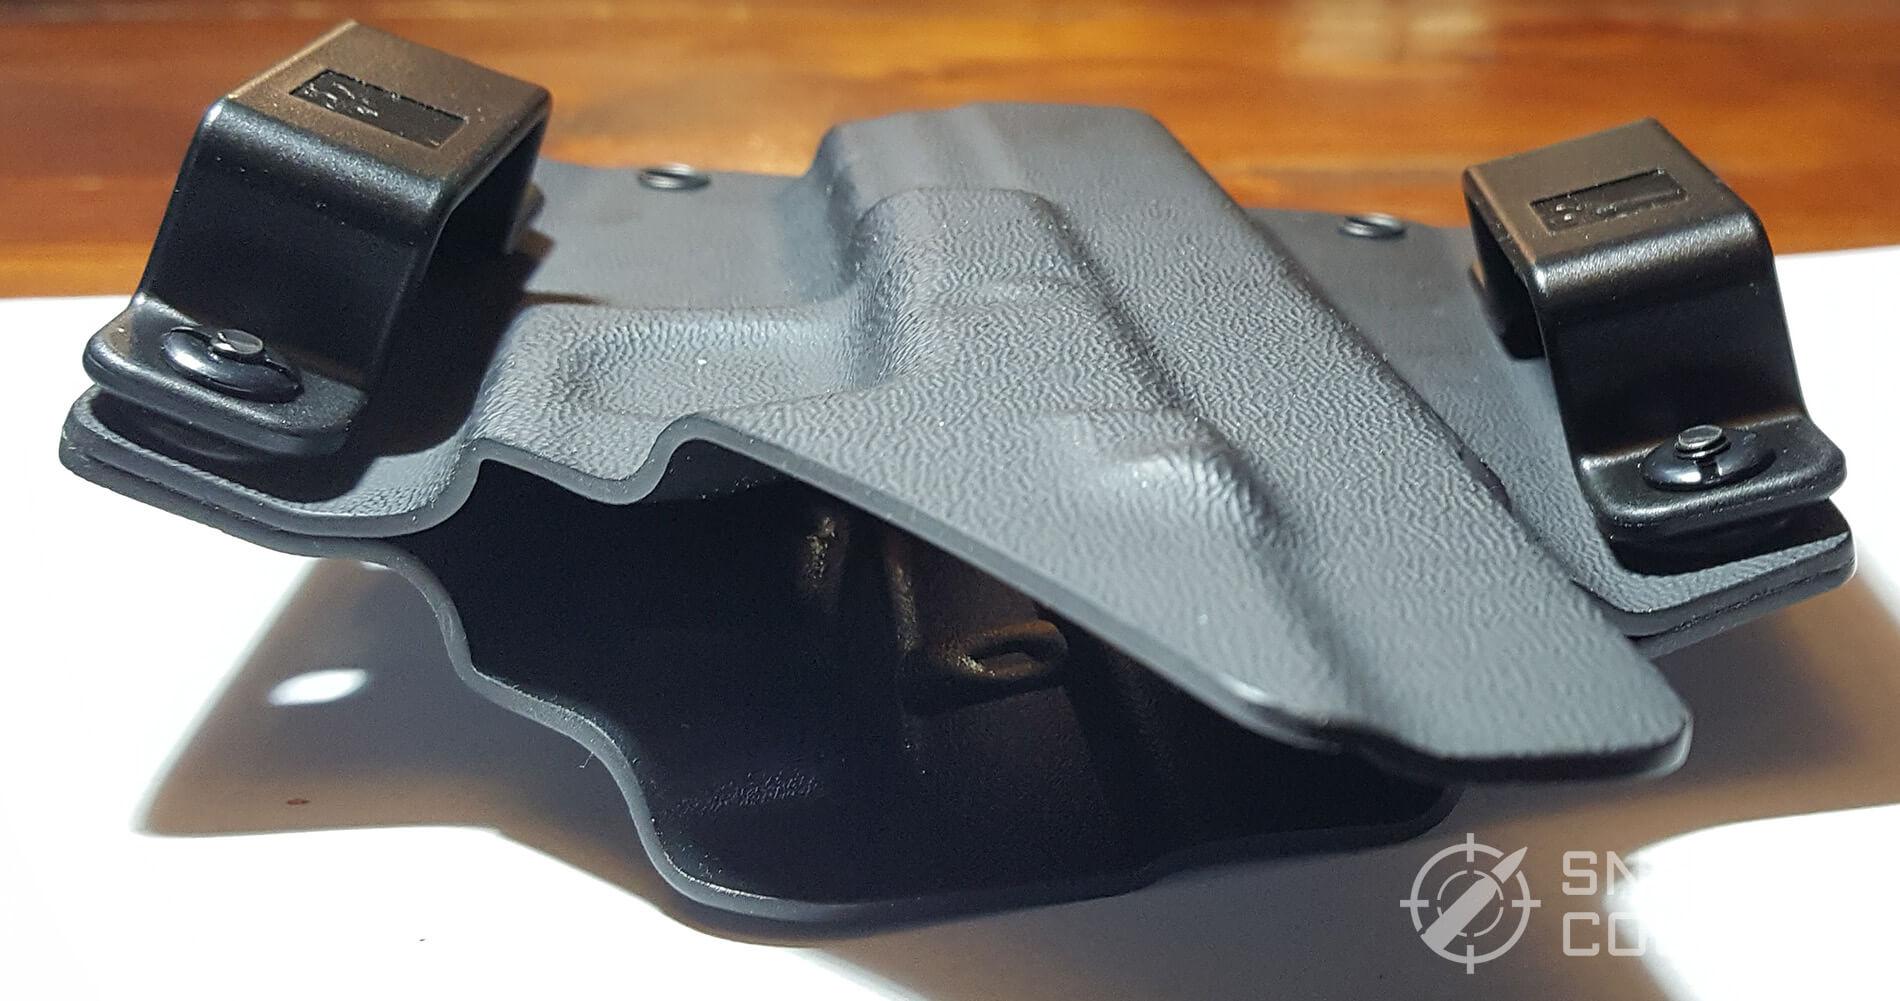 Bravo Concealment BCA OWB pancake curve molding 2